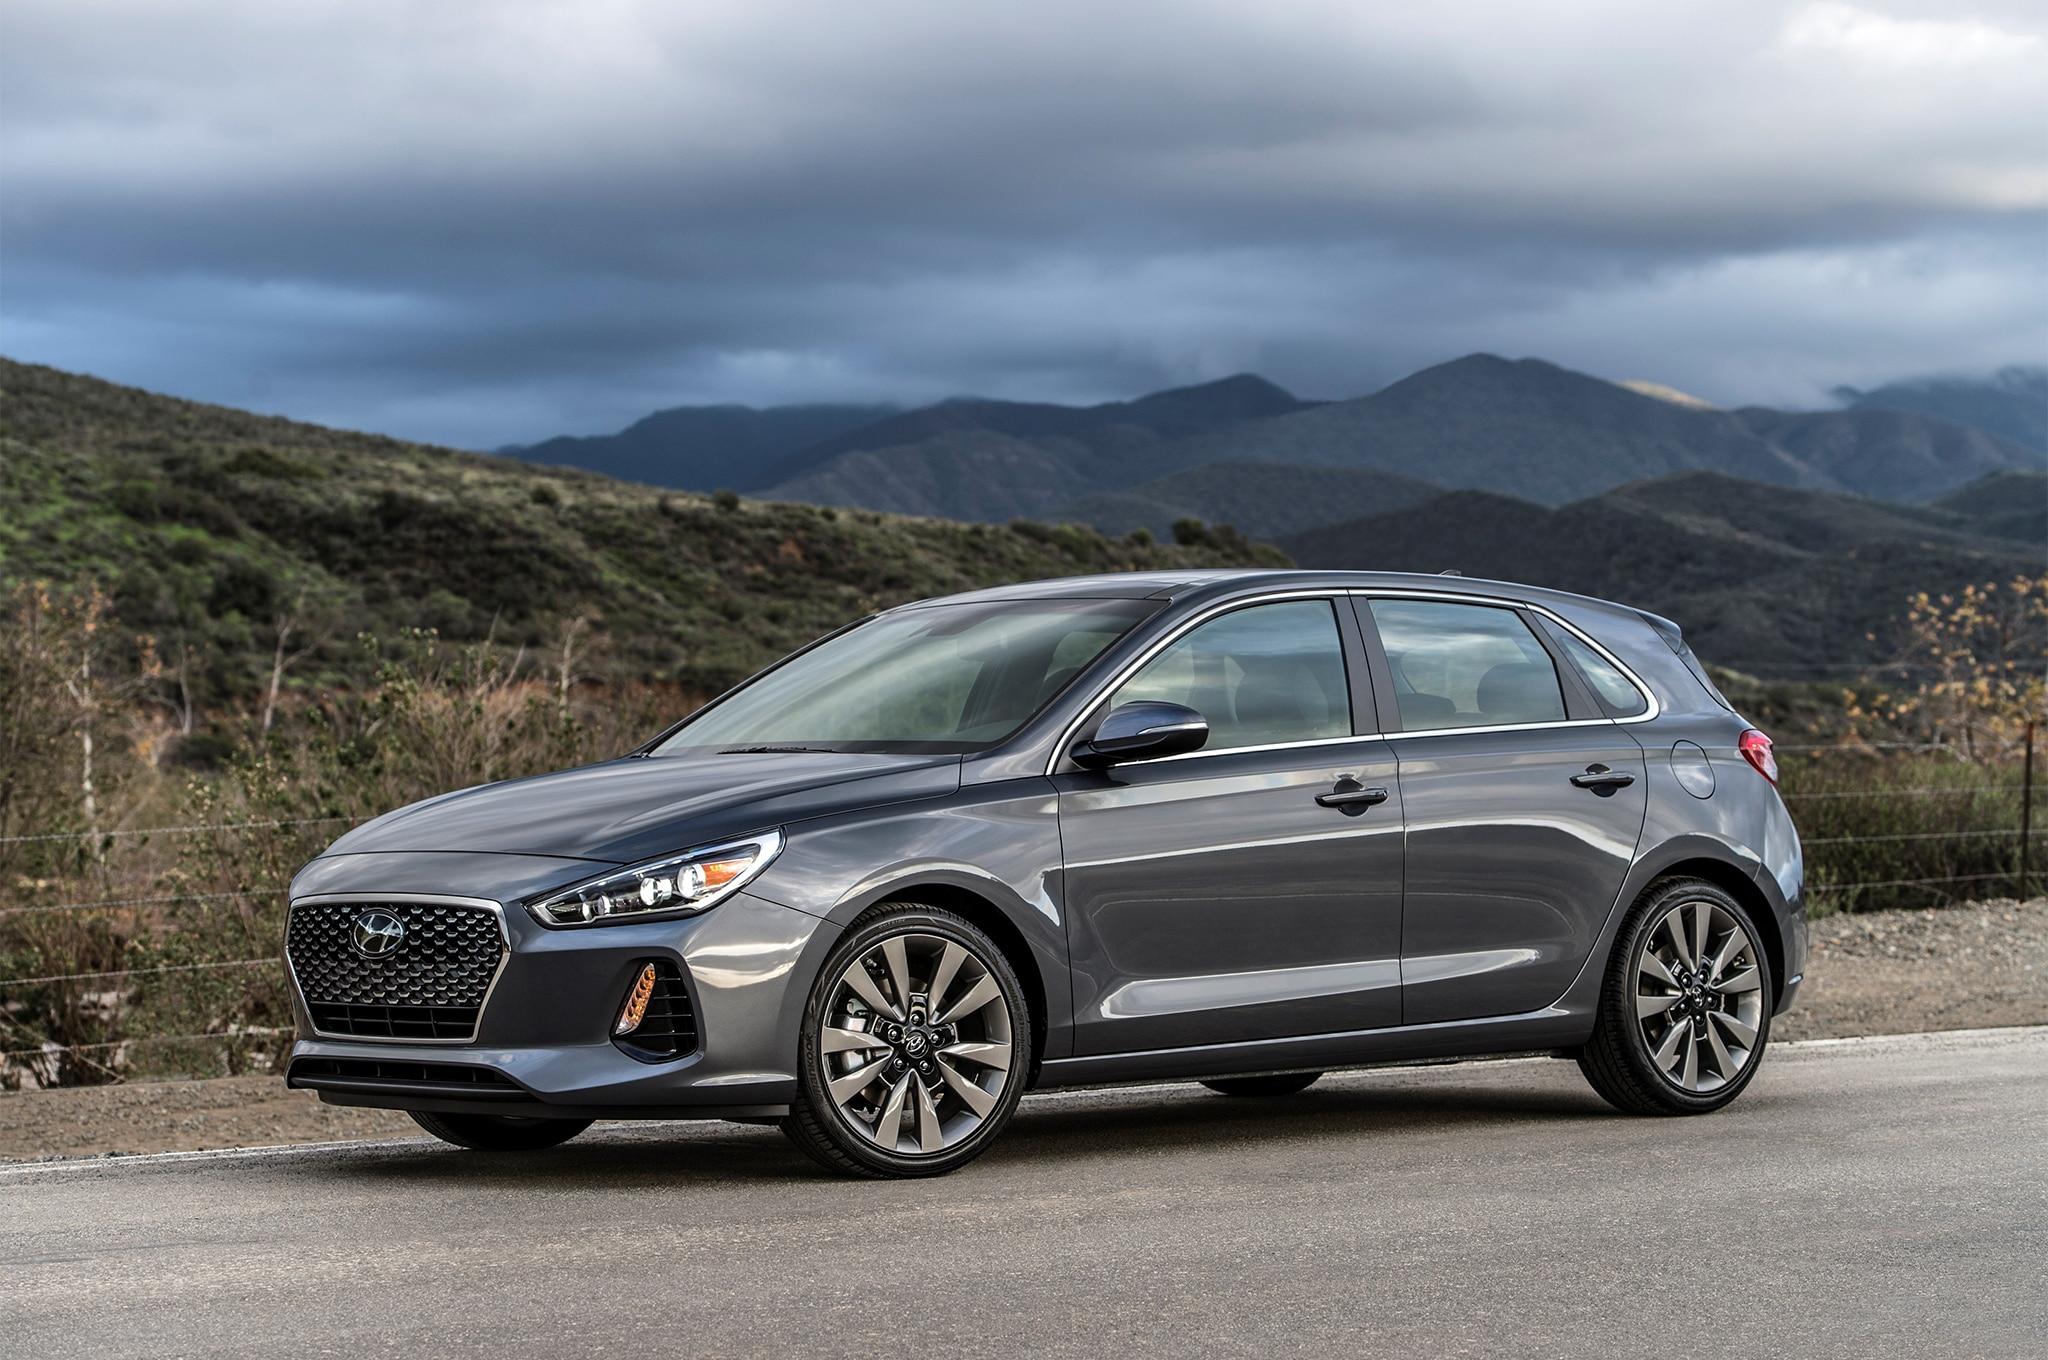 2018-Hyundai-Elantra-GT-front-three-quar